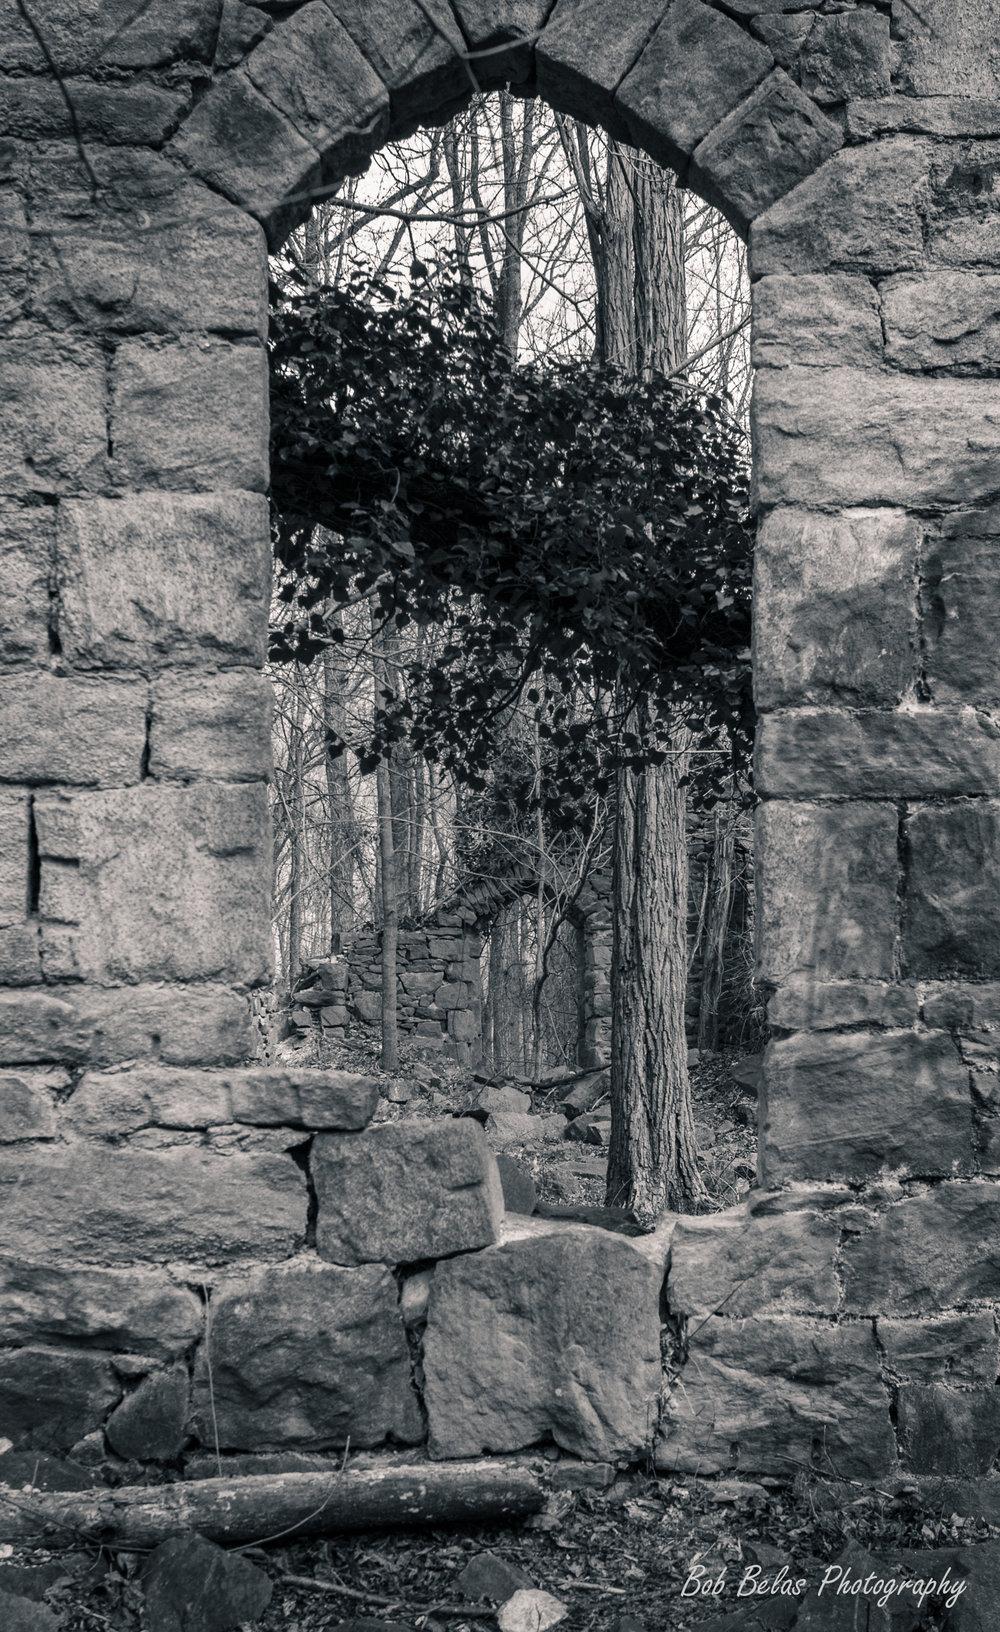 St Stanislaus Arch 2, monochrome